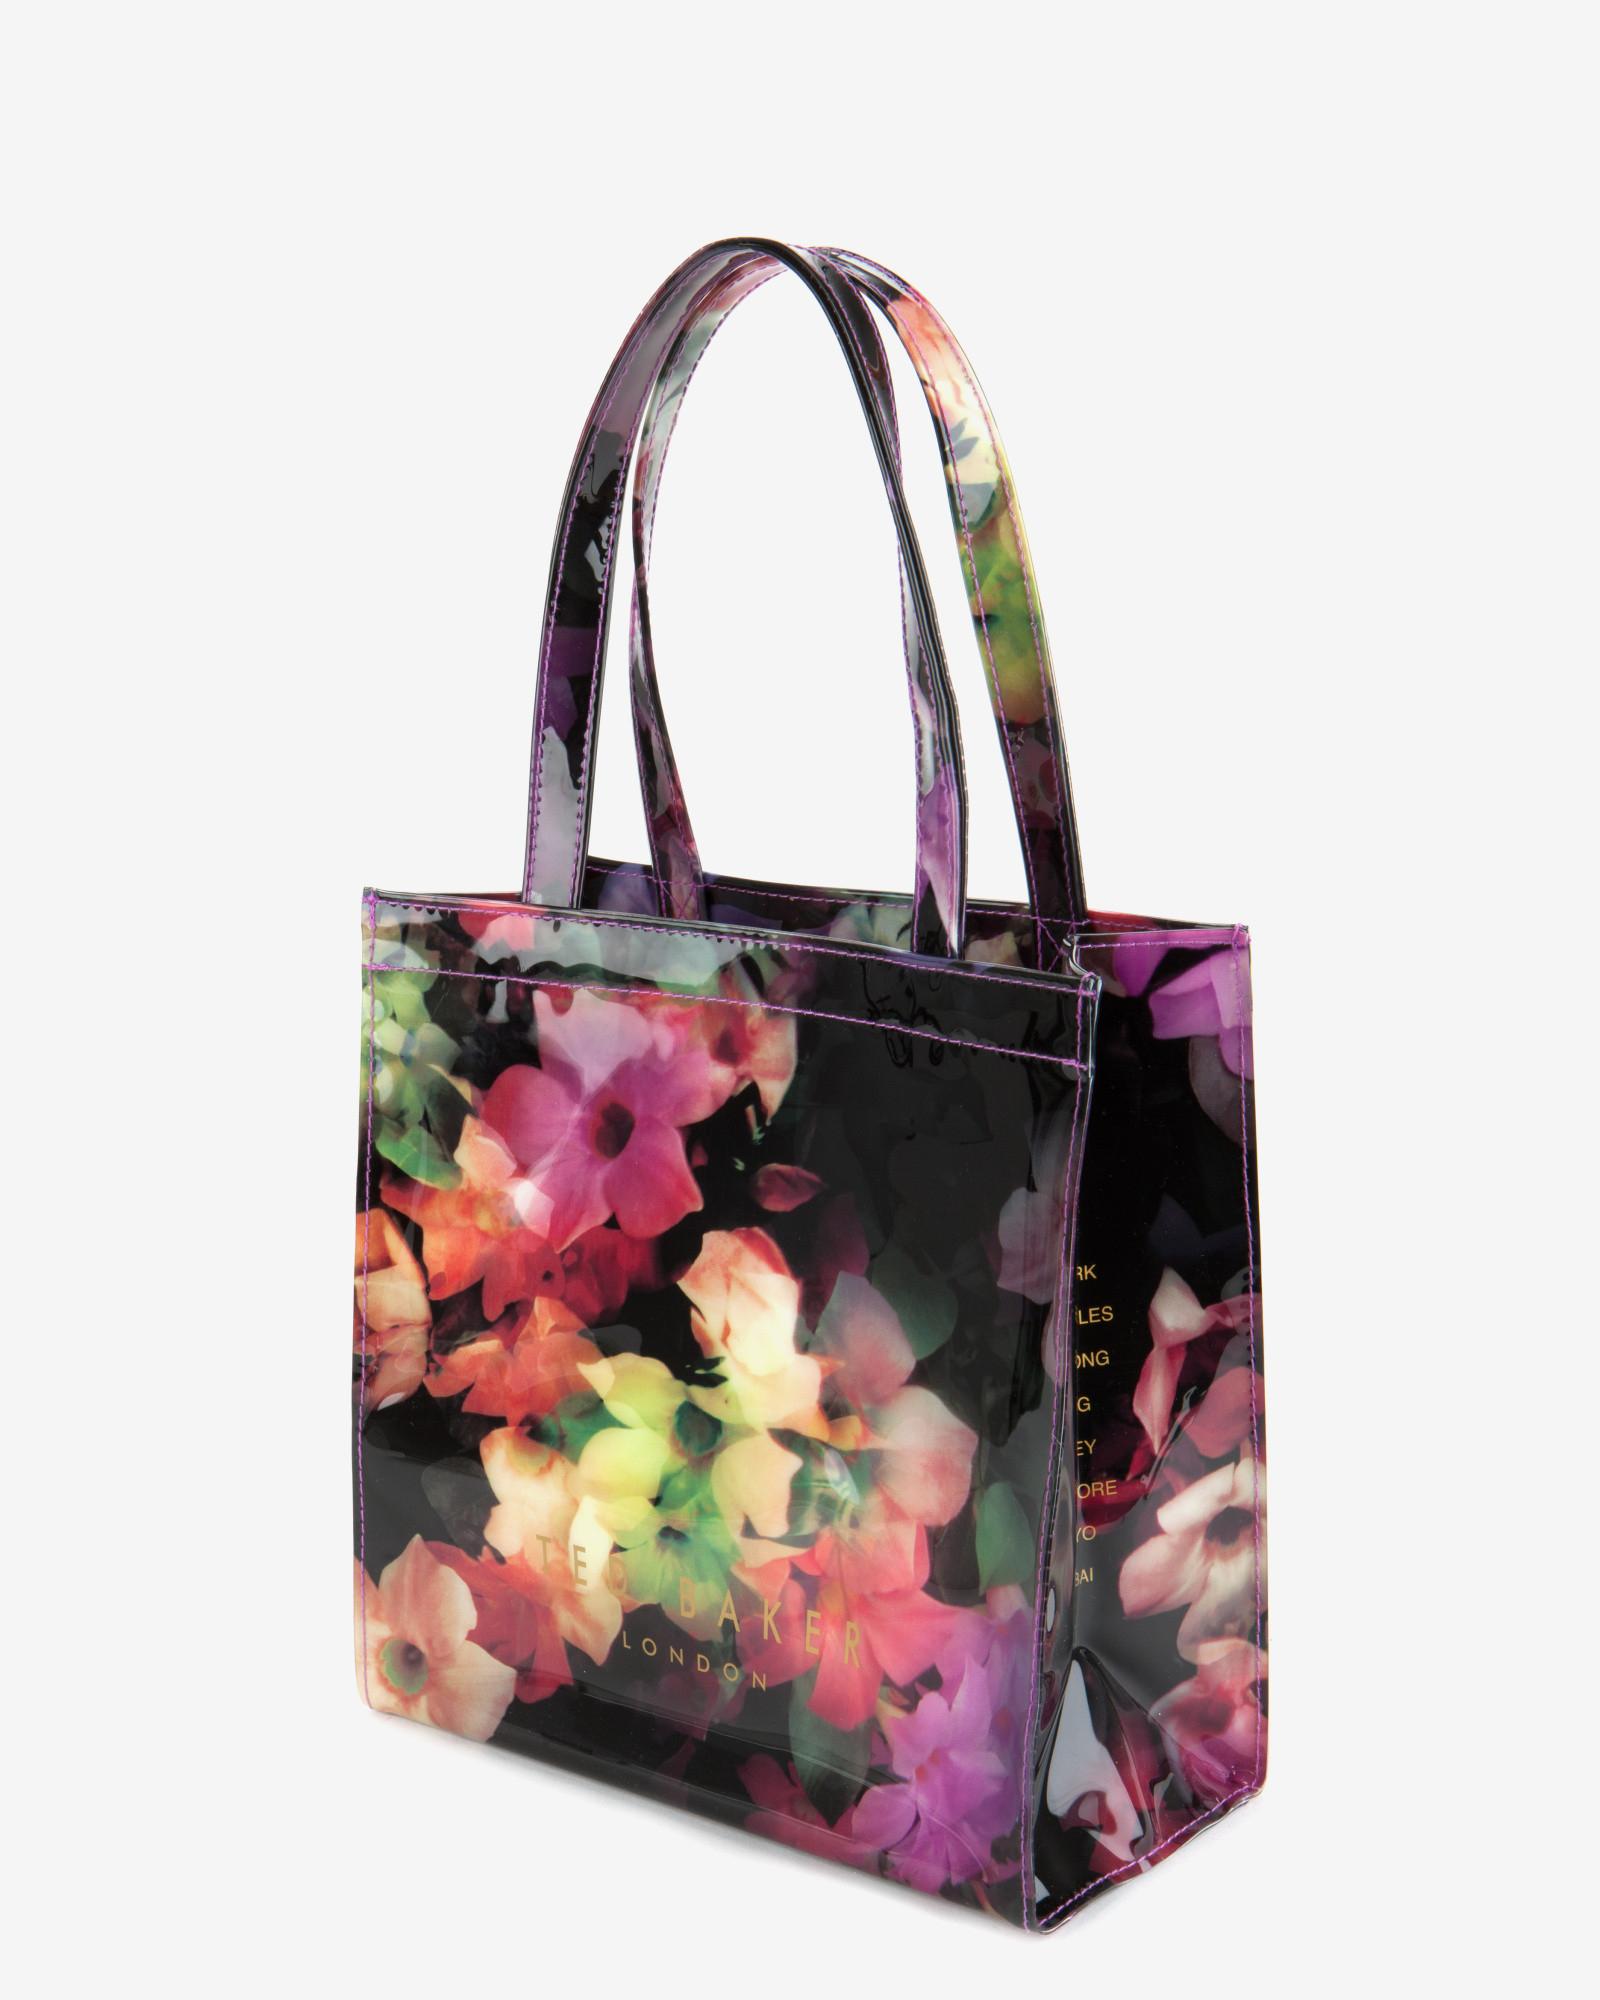 defe767dd3bb6 Ted Baker Small Cascading Floral Shopper Bag in Black - Lyst